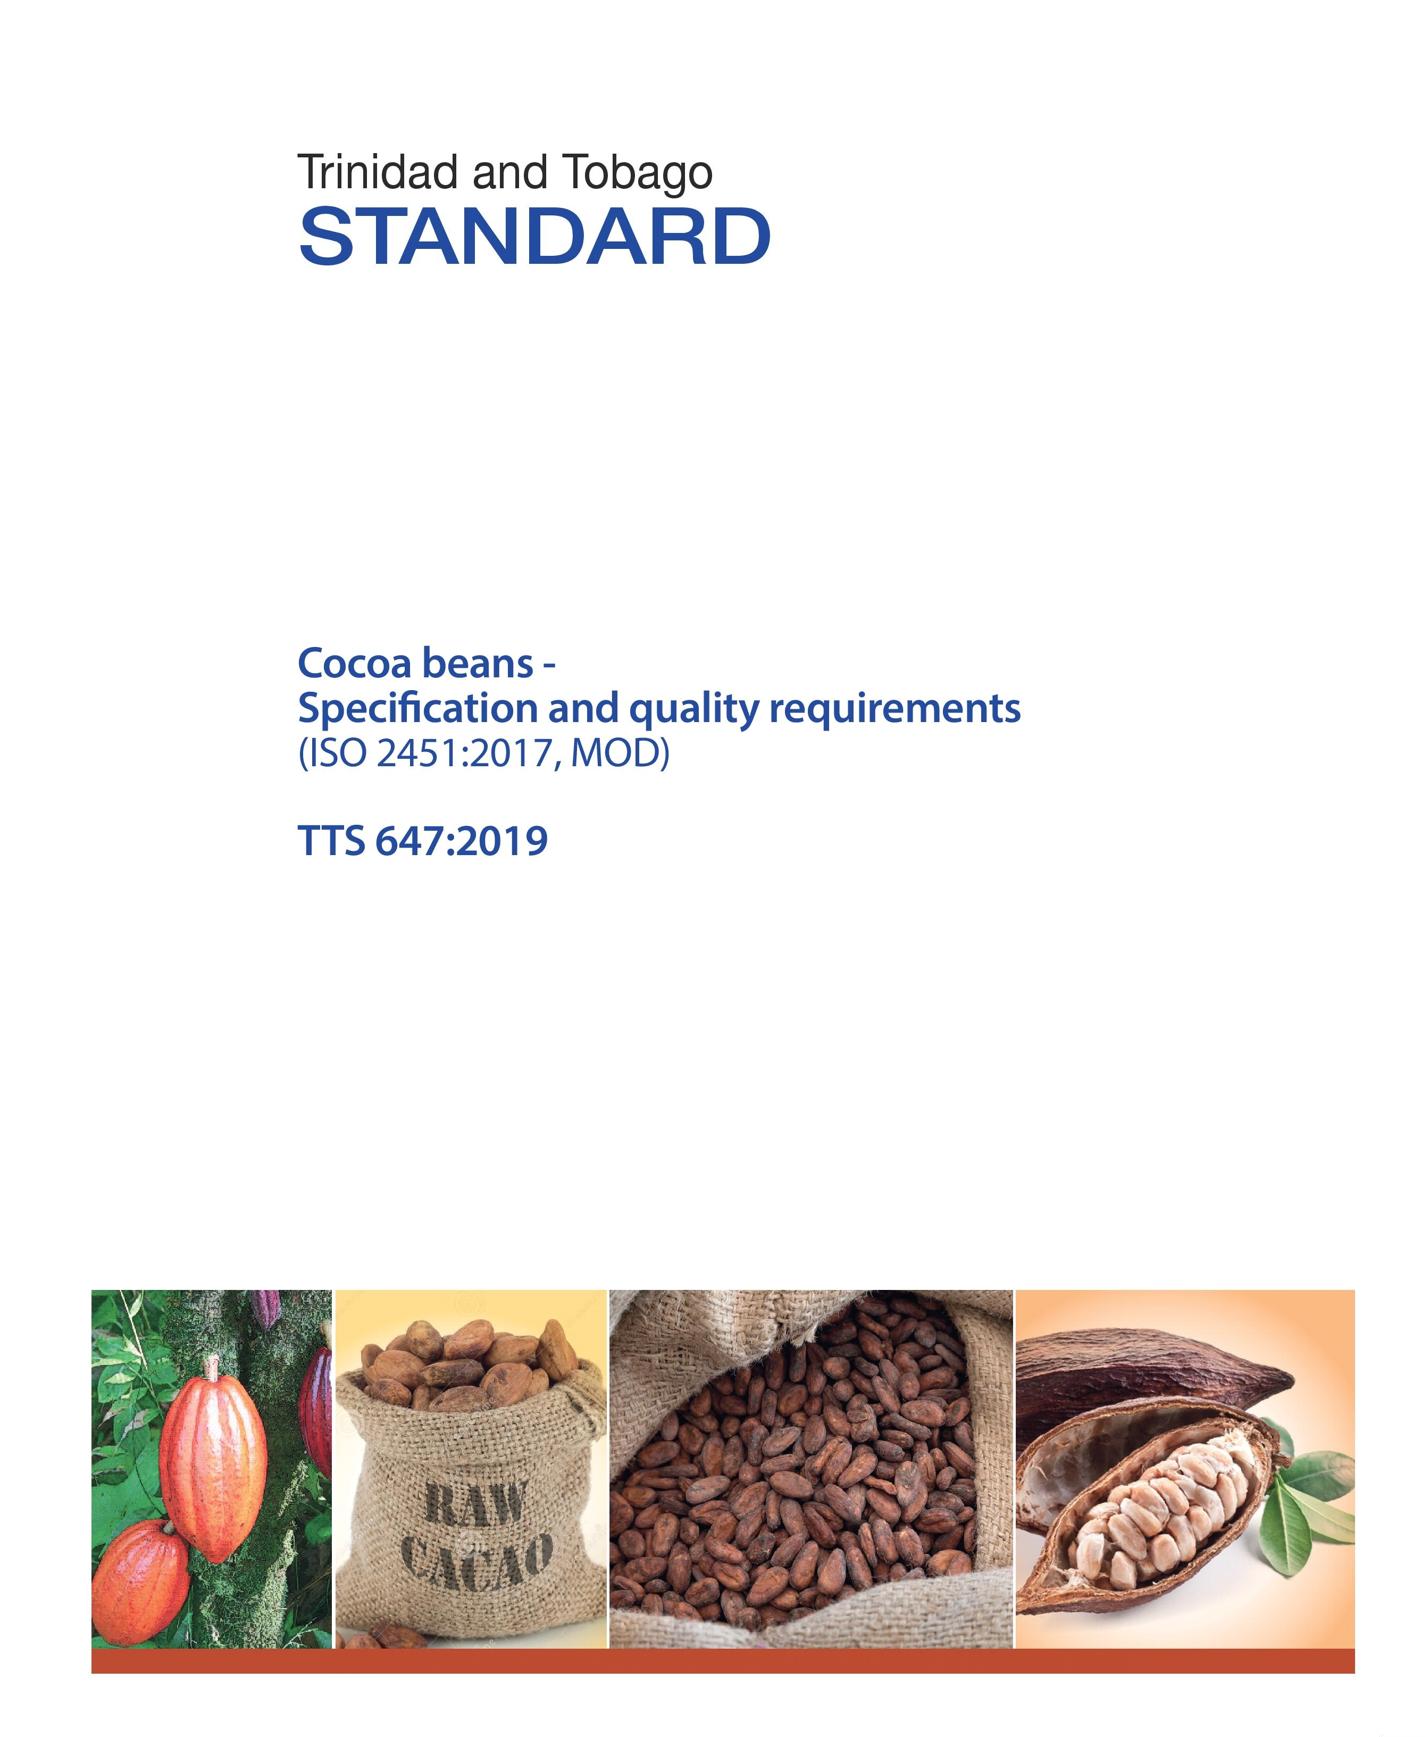 TTS 647:2019, Cocoa Beans